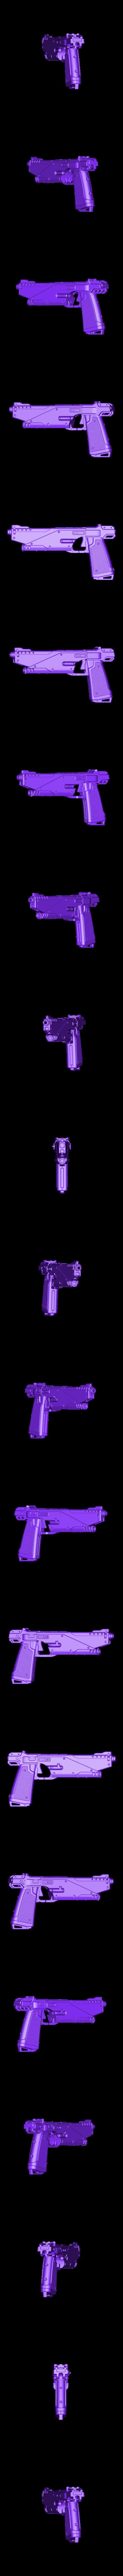 WESTAR-35 blaster pistol.stl Download STL file WESTAR 35 blaster pistol  • 3D printable object, 3dpicasso